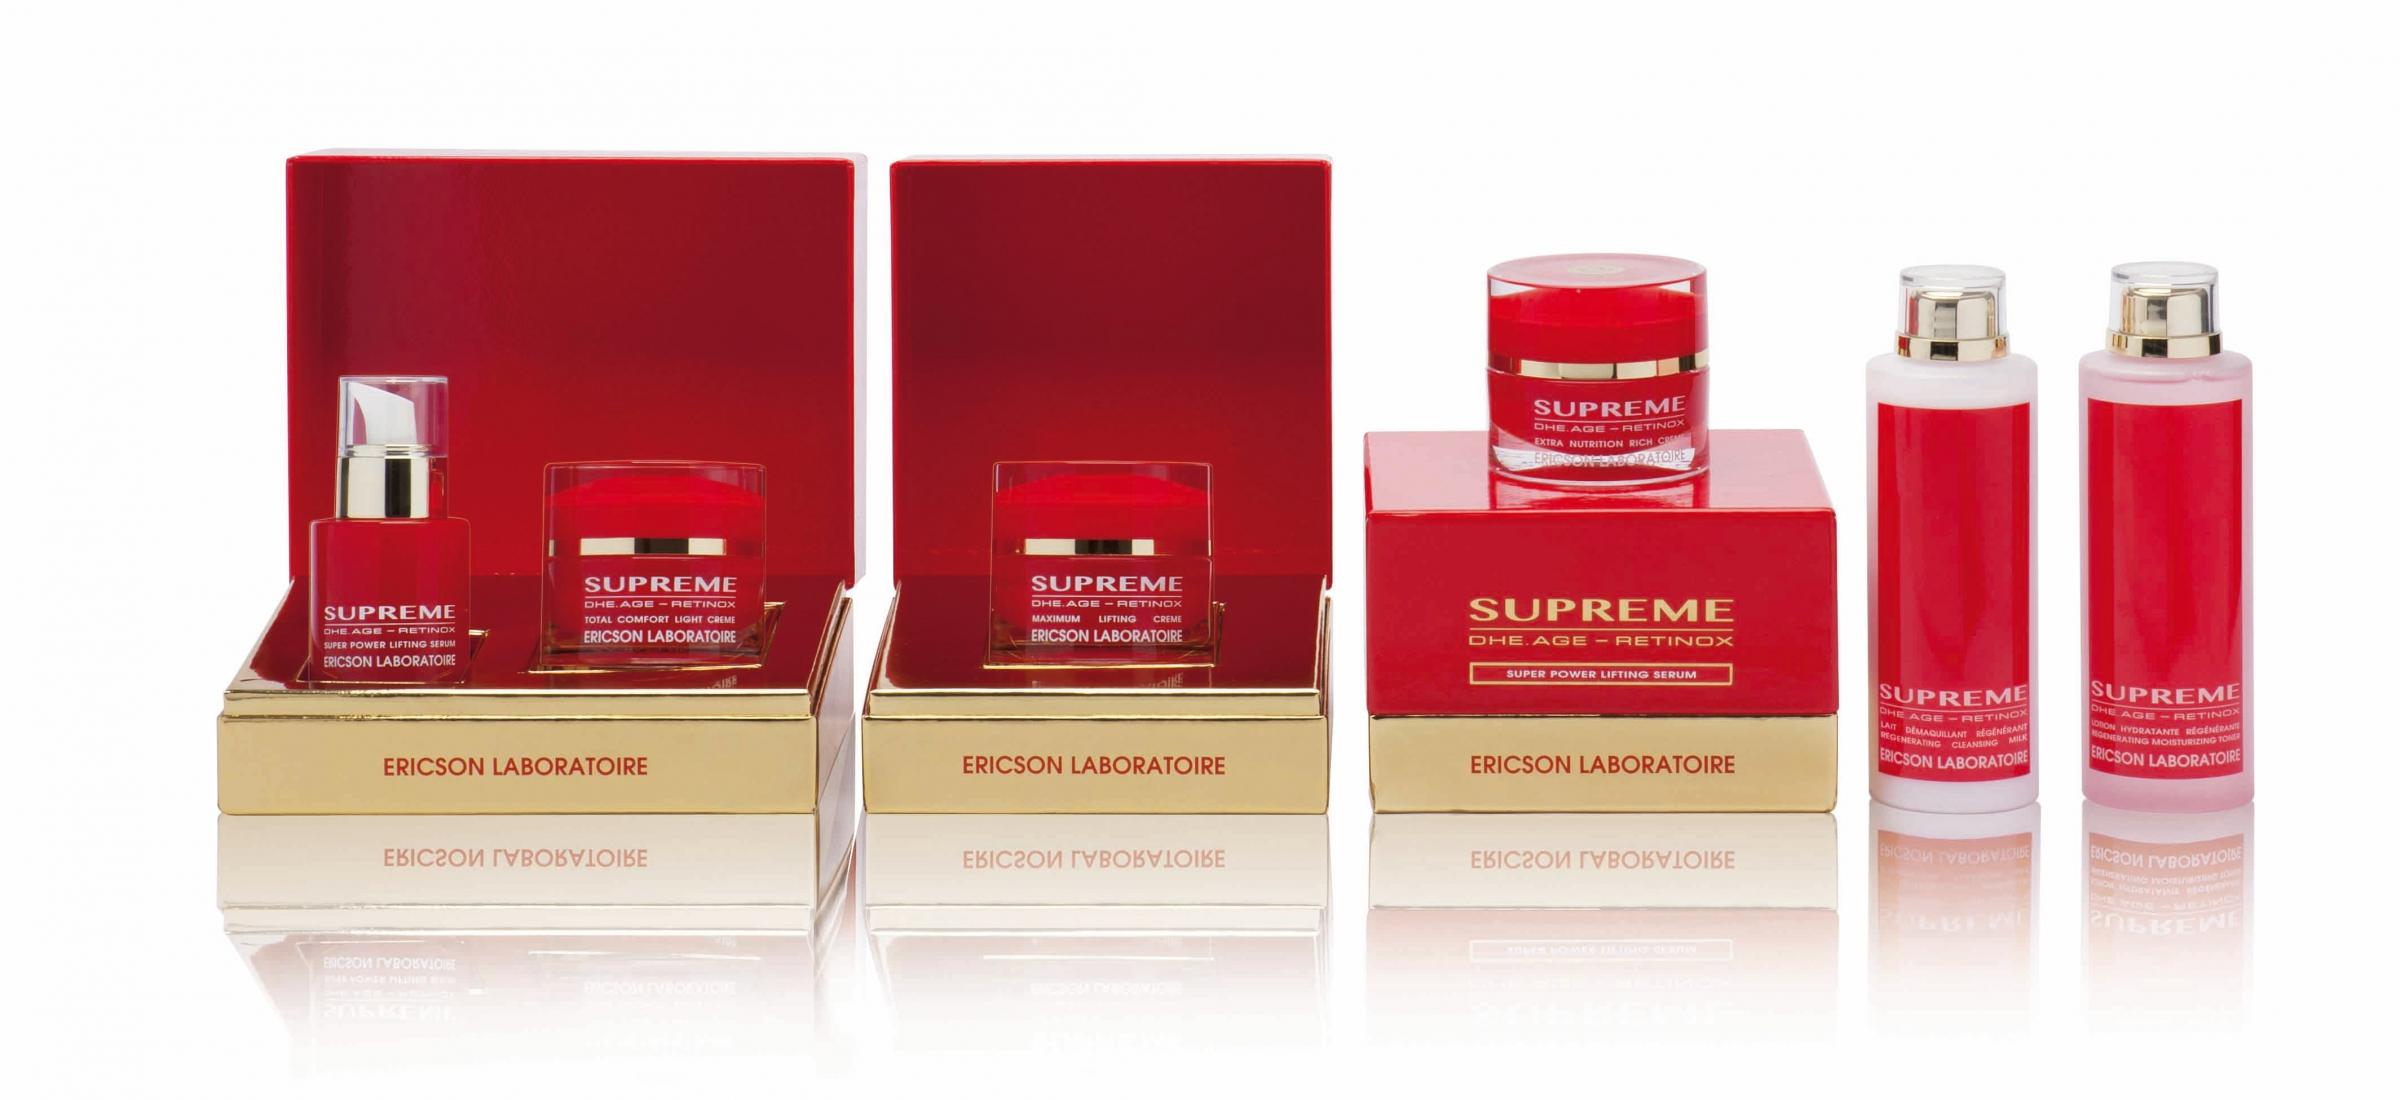 Supreme-Retail